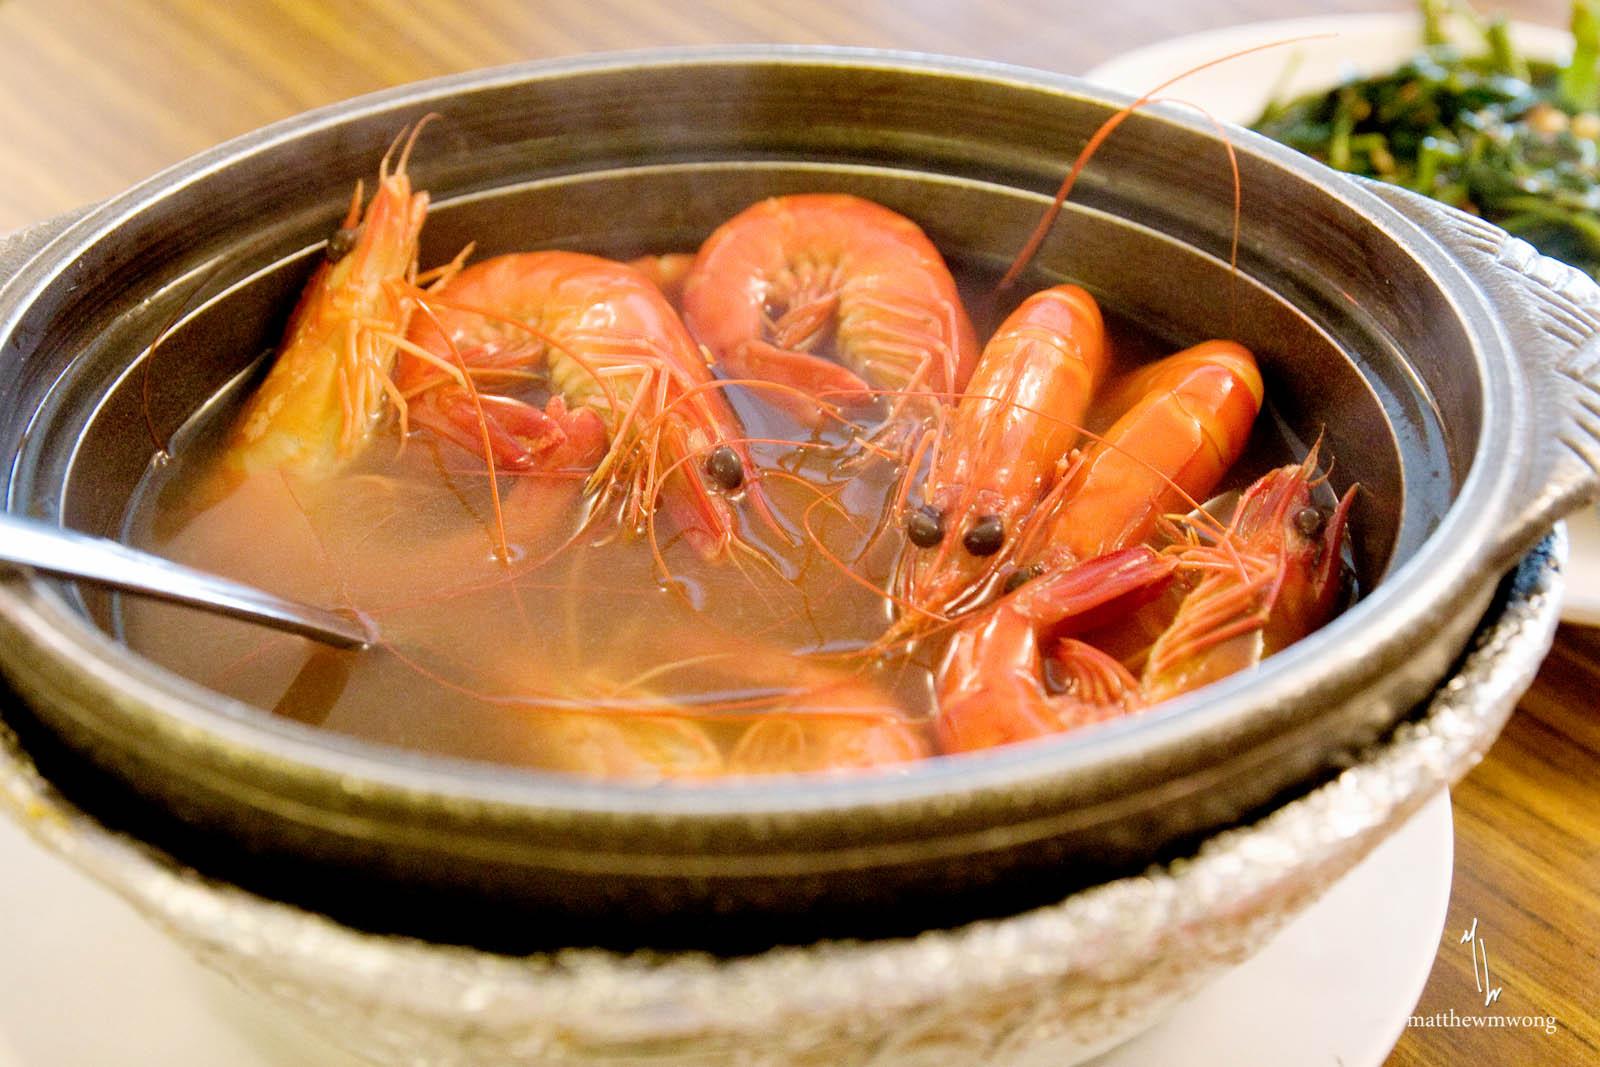 Herbal Drunken Prawns from Jumbo Seafood